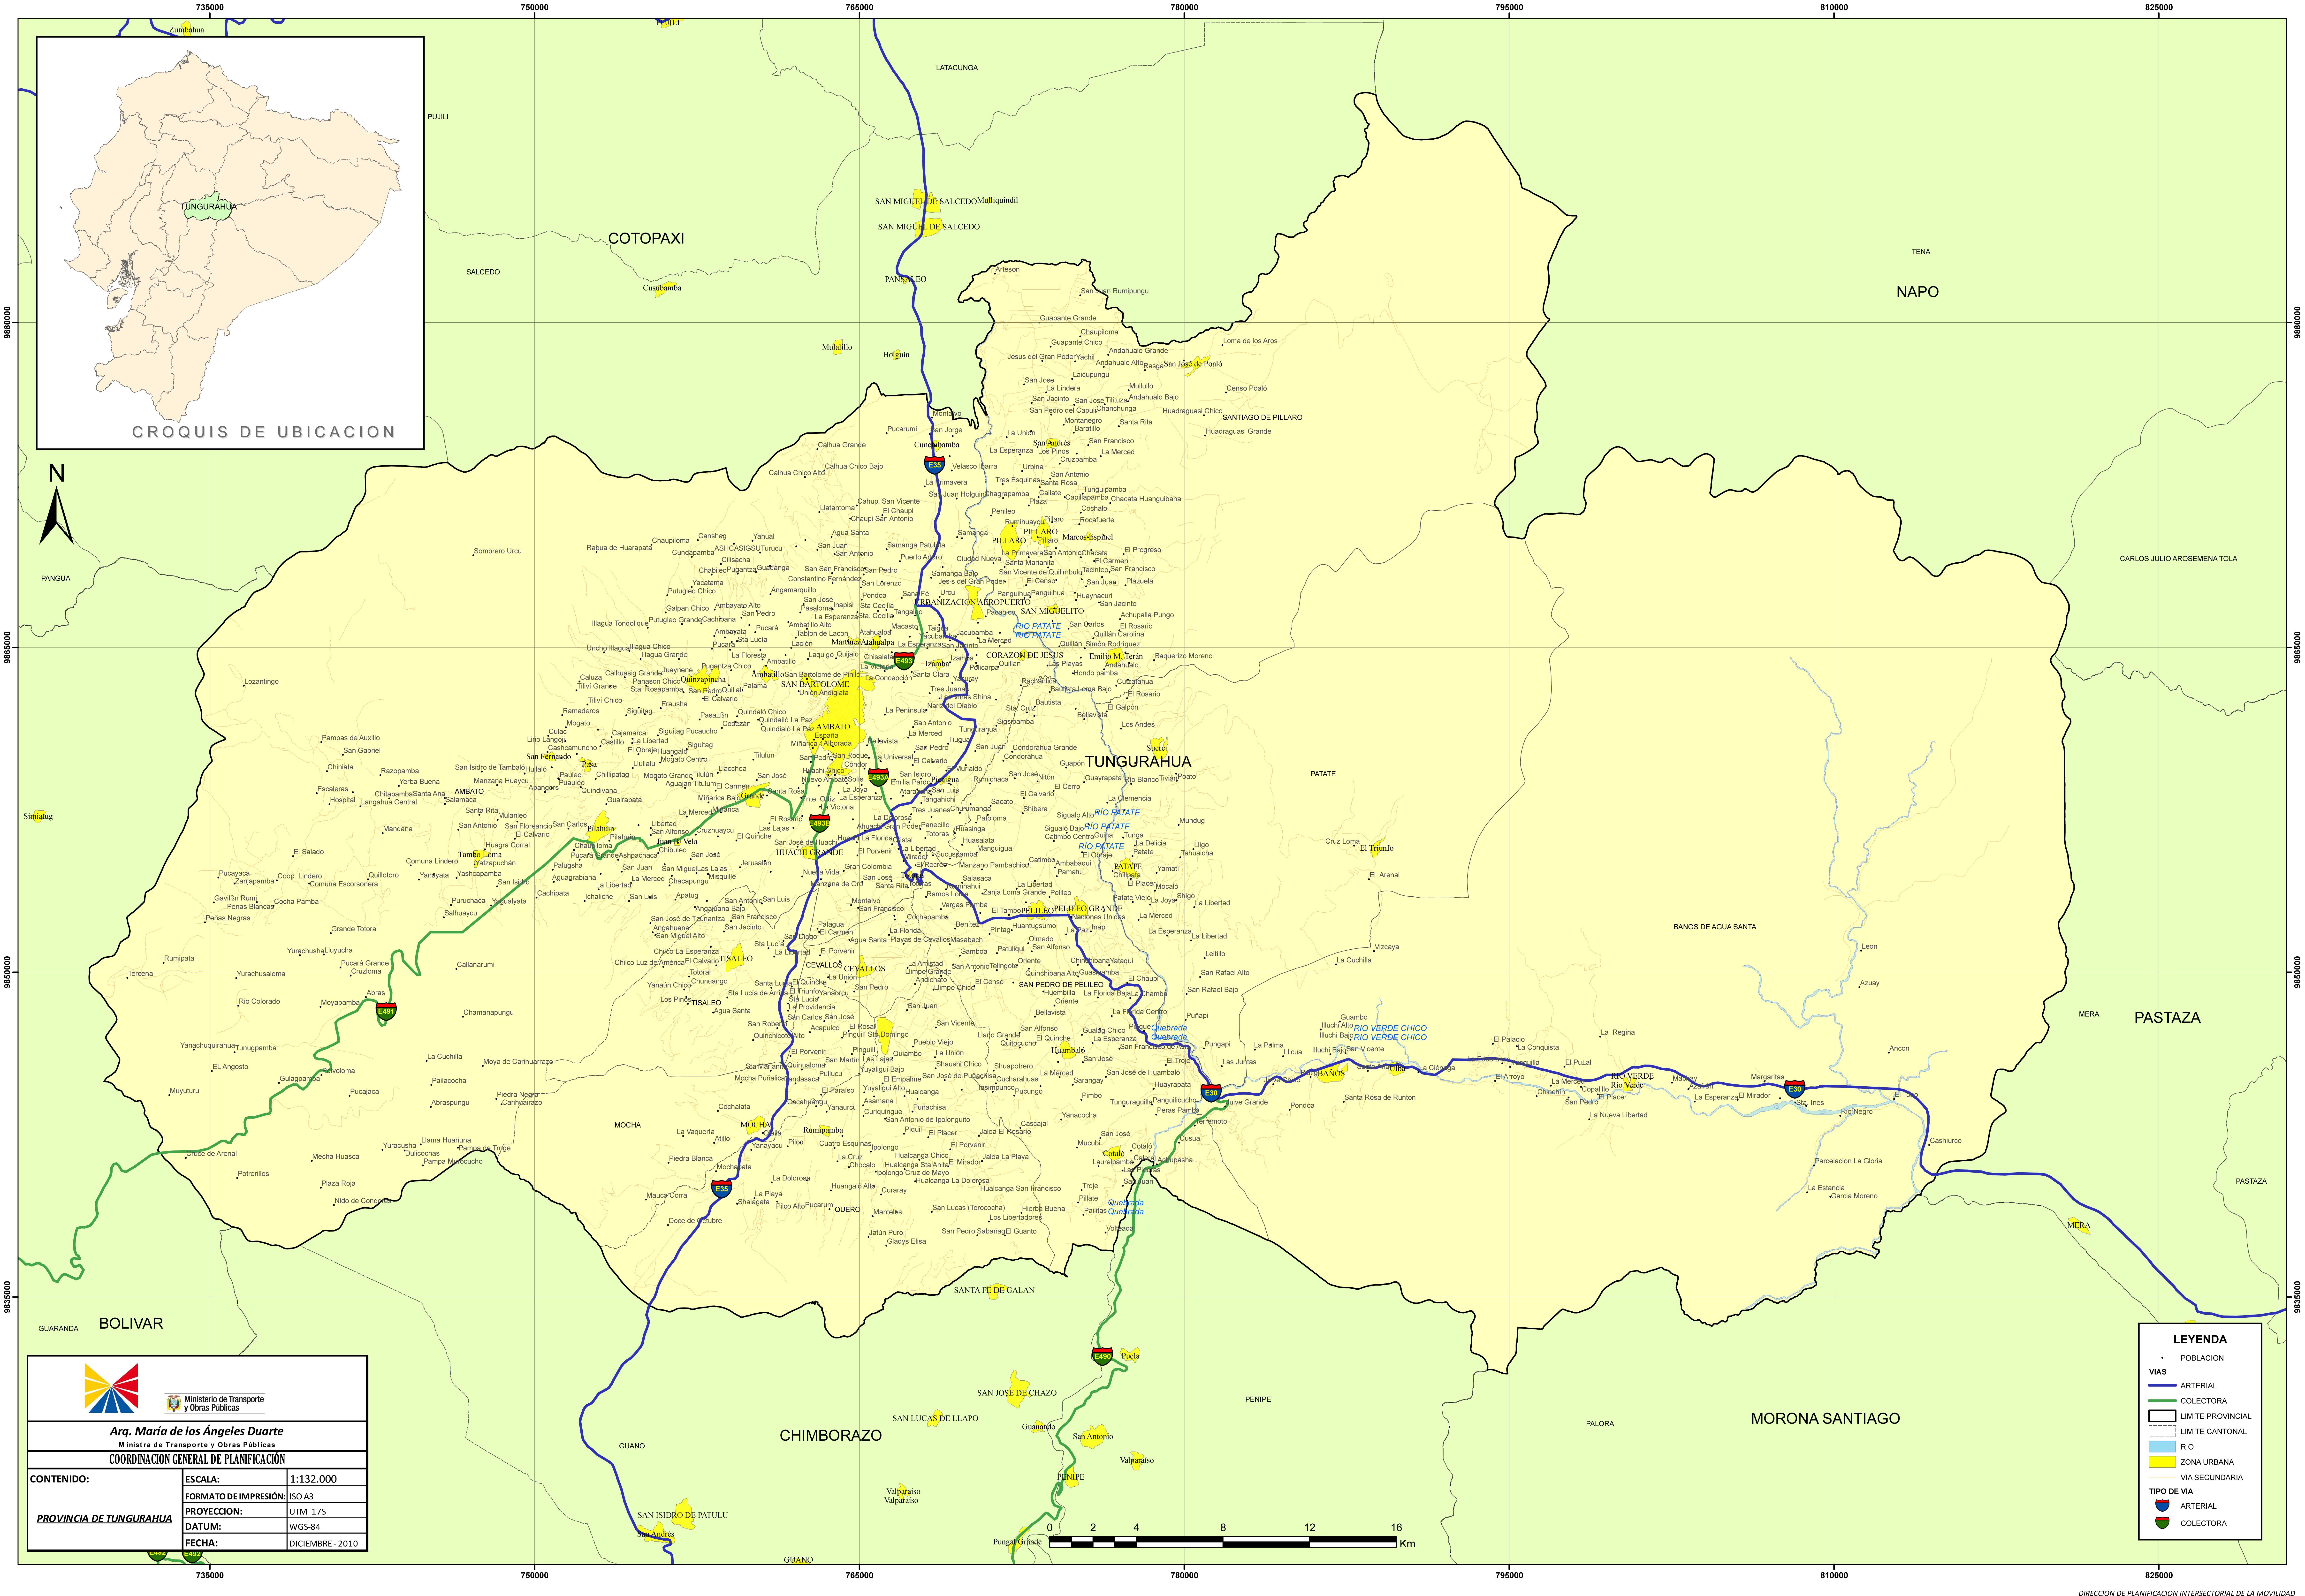 Mapa de Tungurahua 2010